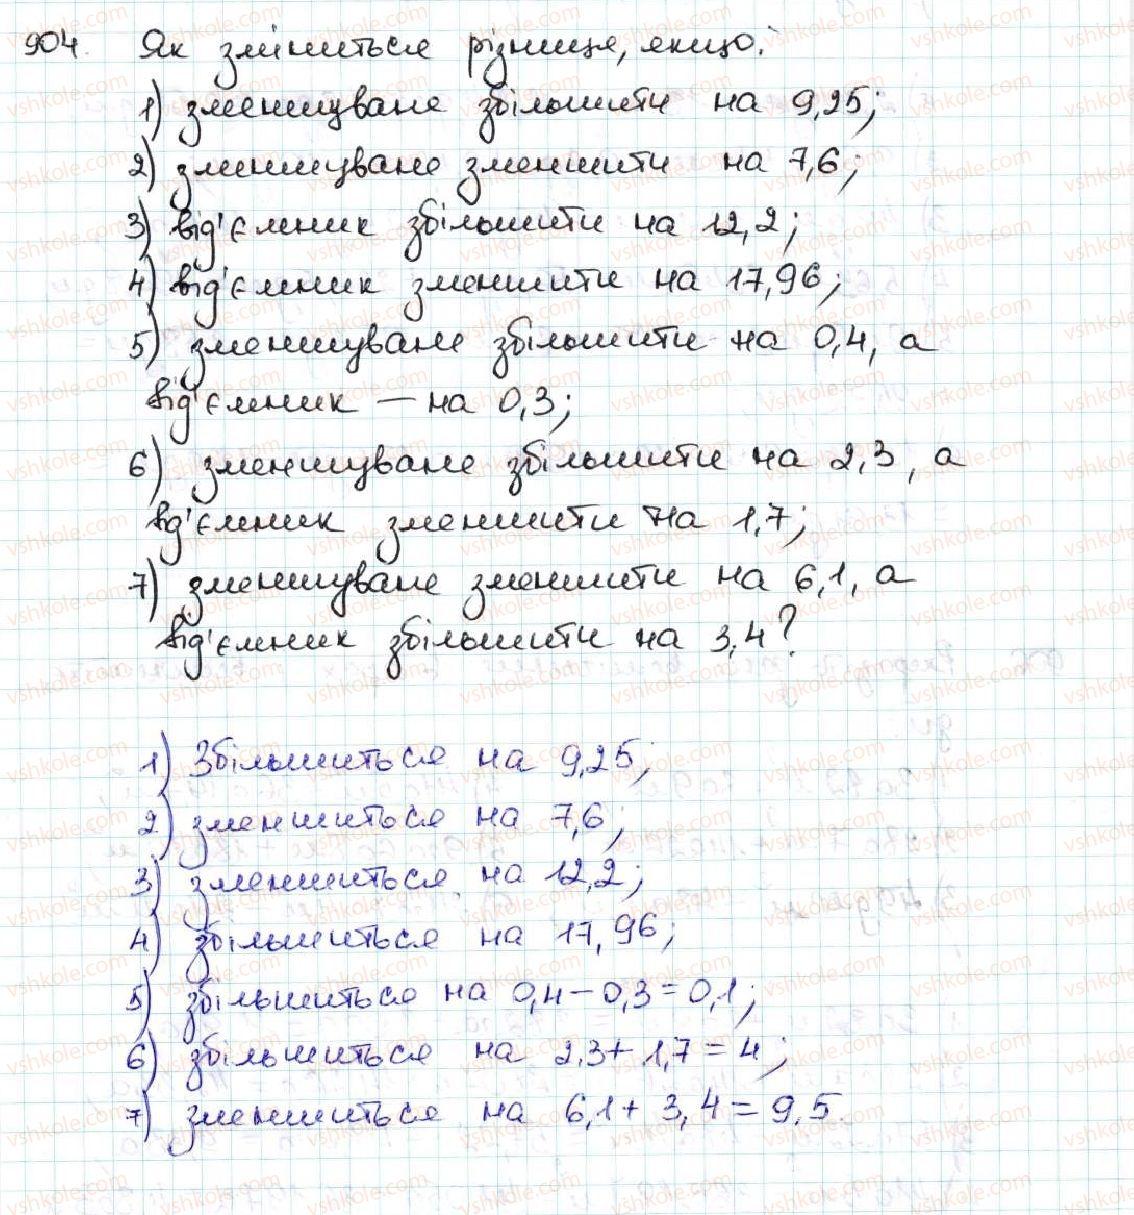 5-matematika-ag-merzlyak-vb-polonskij-ms-yakir-2013--5-desyatkovi-drobi-33-dodavannya-i-vidnimannya-desyatkovih-drobiv-904.jpg